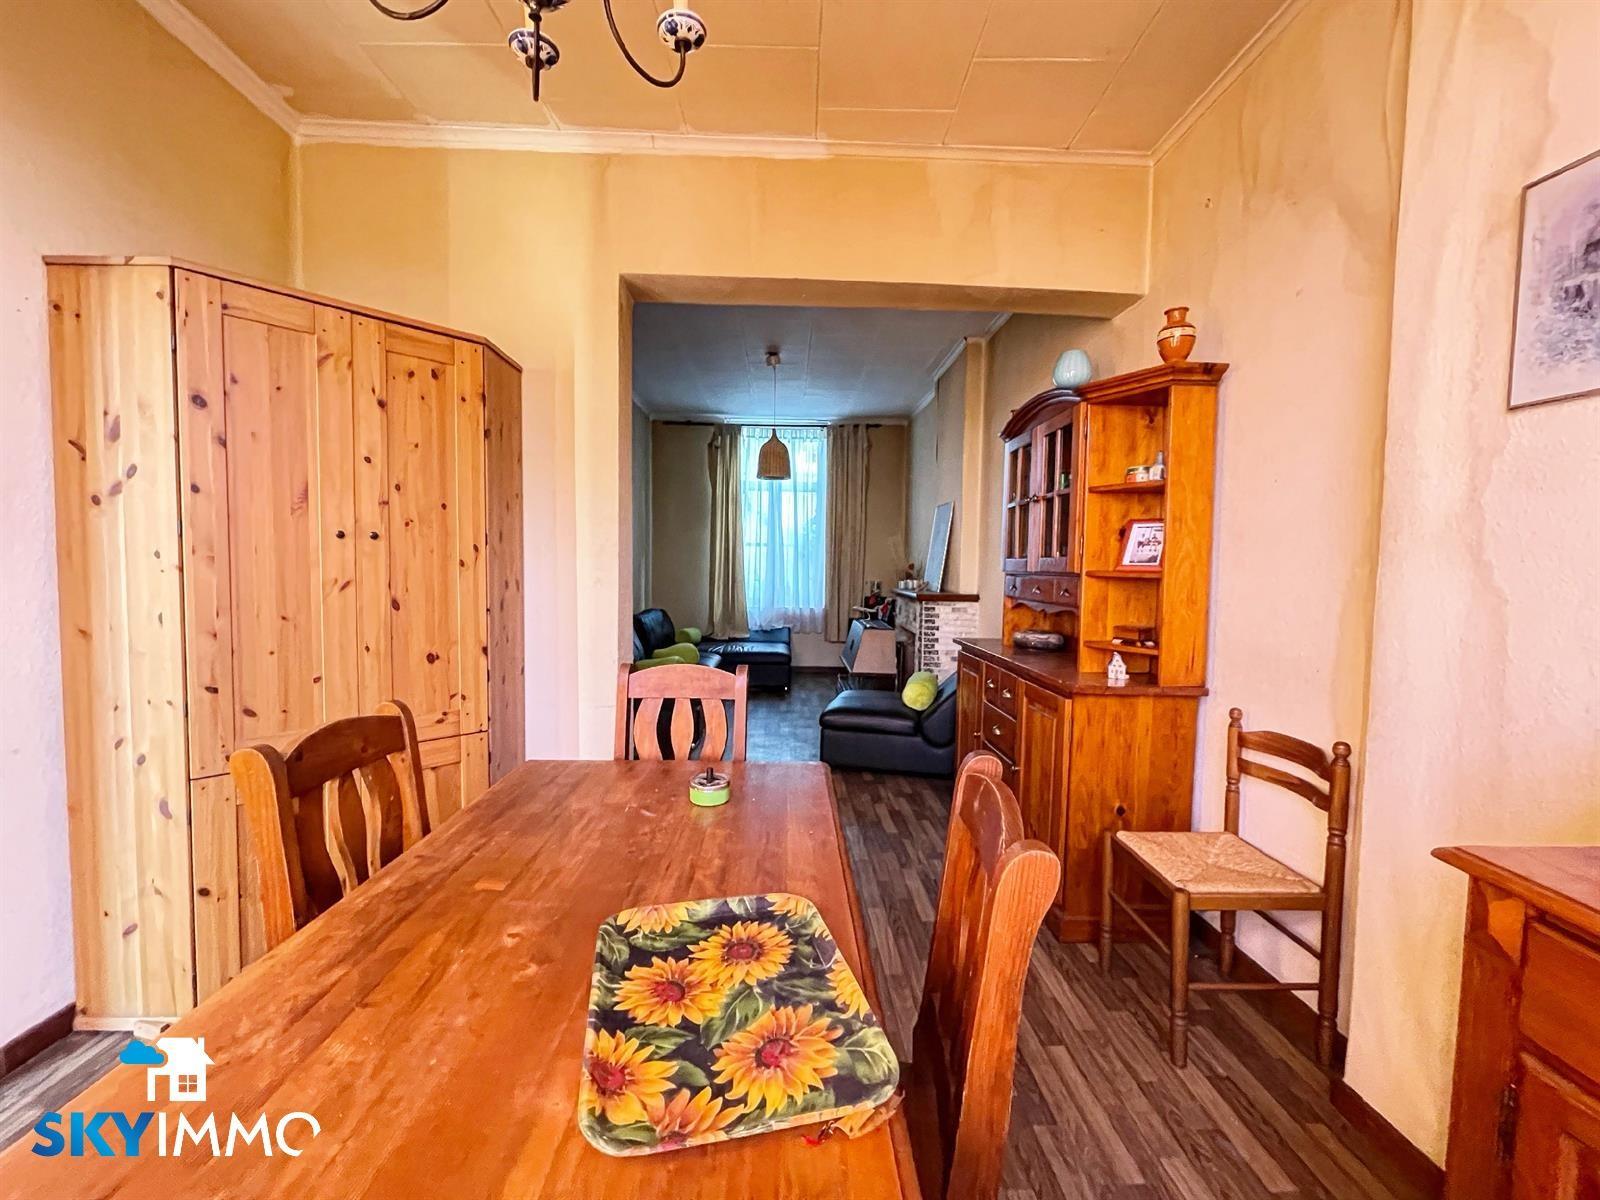 Maison - Seraing Jemeppesur-Meuse - #4383857-5